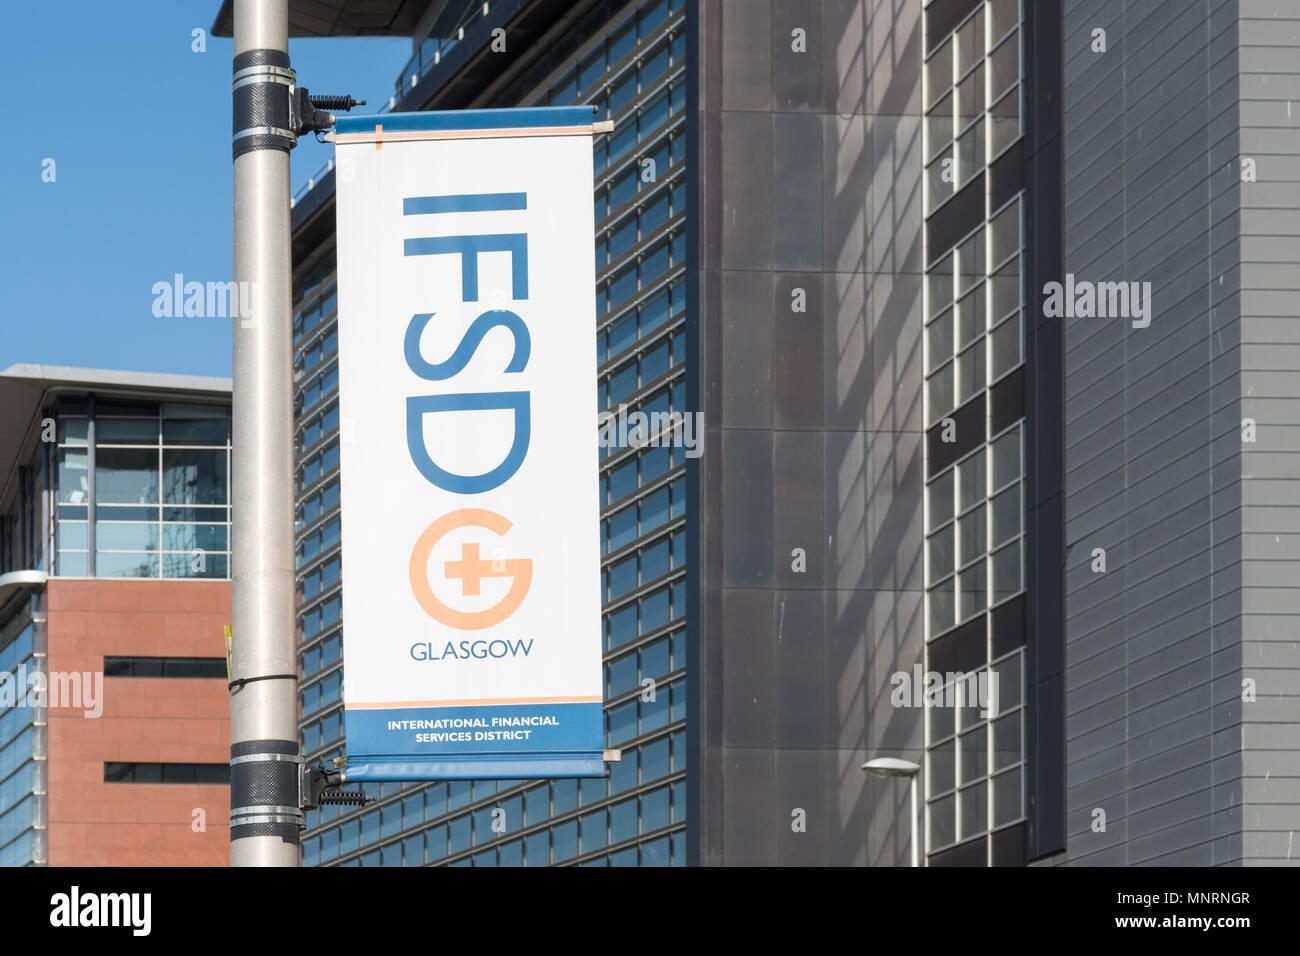 Glasgow IFSD - International Financial Services District - banner, Scotland, UK - Stock Image